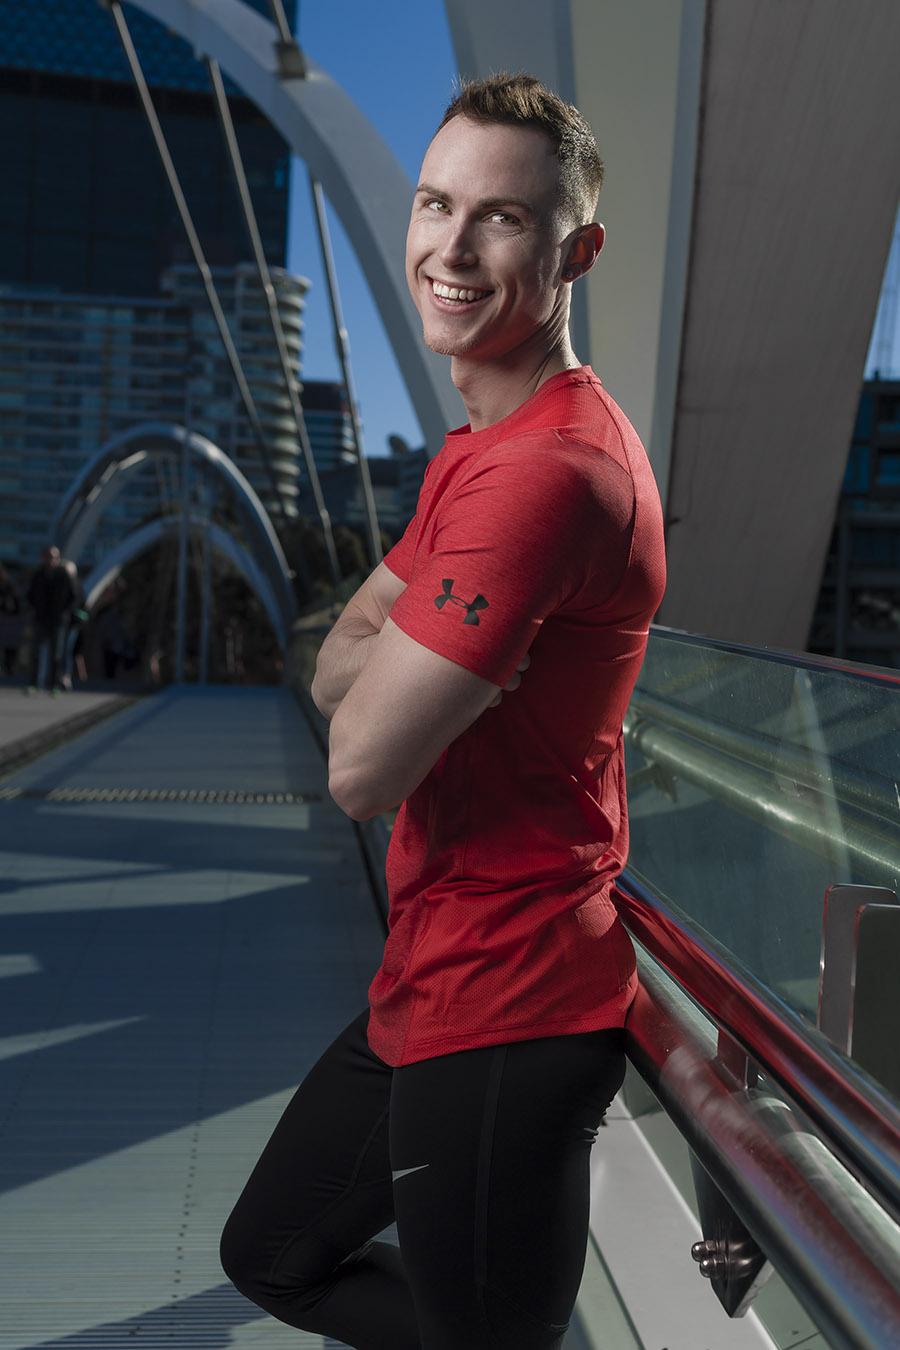 Jordan during Melbourne fitness photo shoot